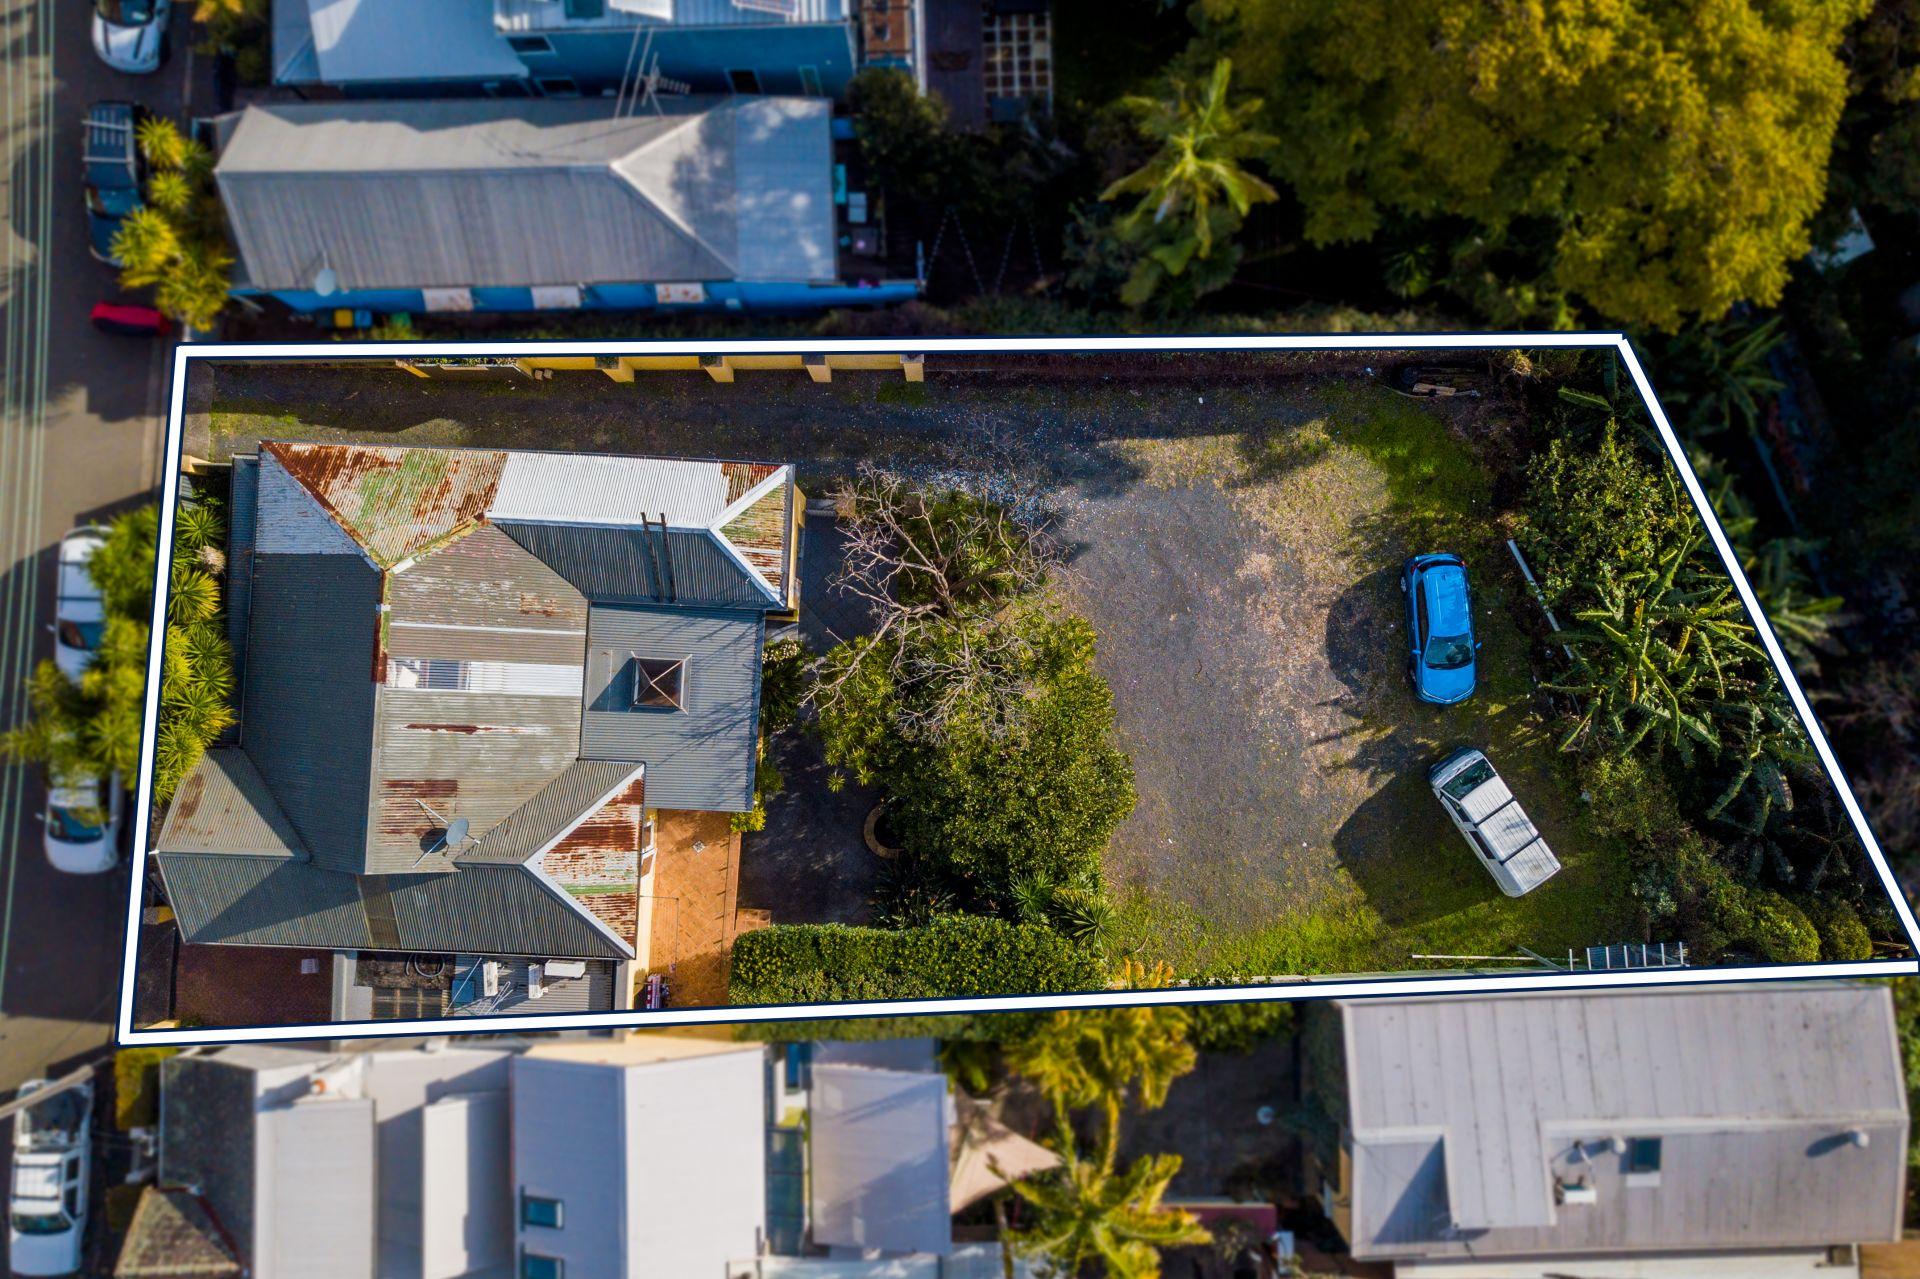 18-20 Water Street, Annandale